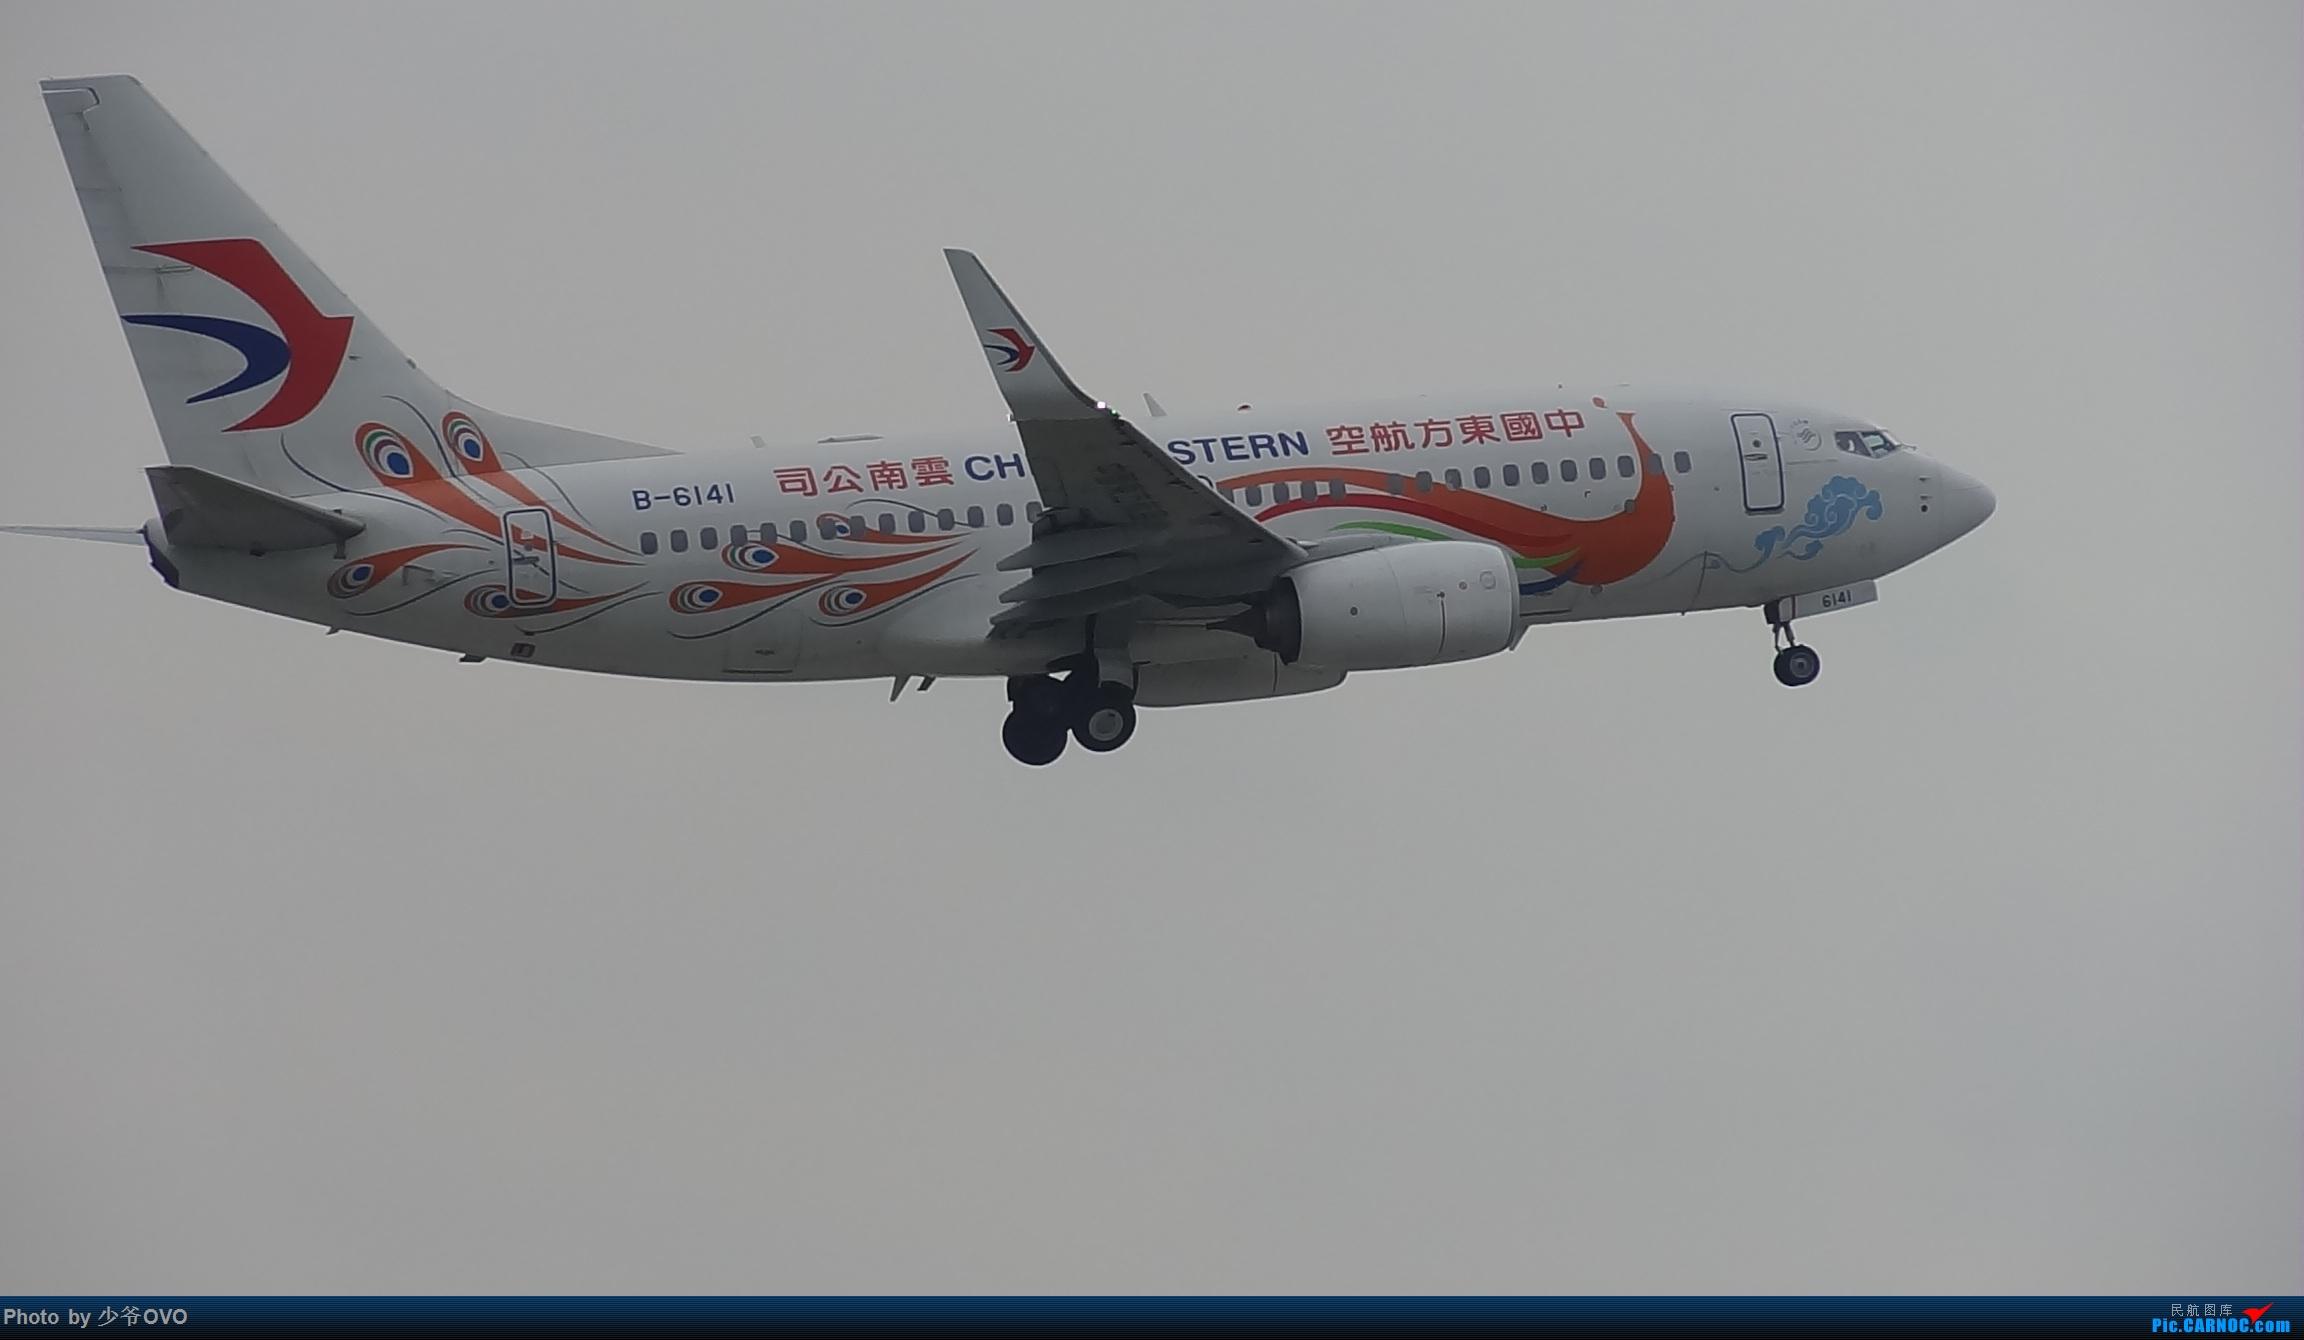 Re:[原创]CKG重庆江北机场拍机,国航744,B-2447,和一群大佬拍机 BOEING 737-700 B-6141 中国重庆江北国际机场